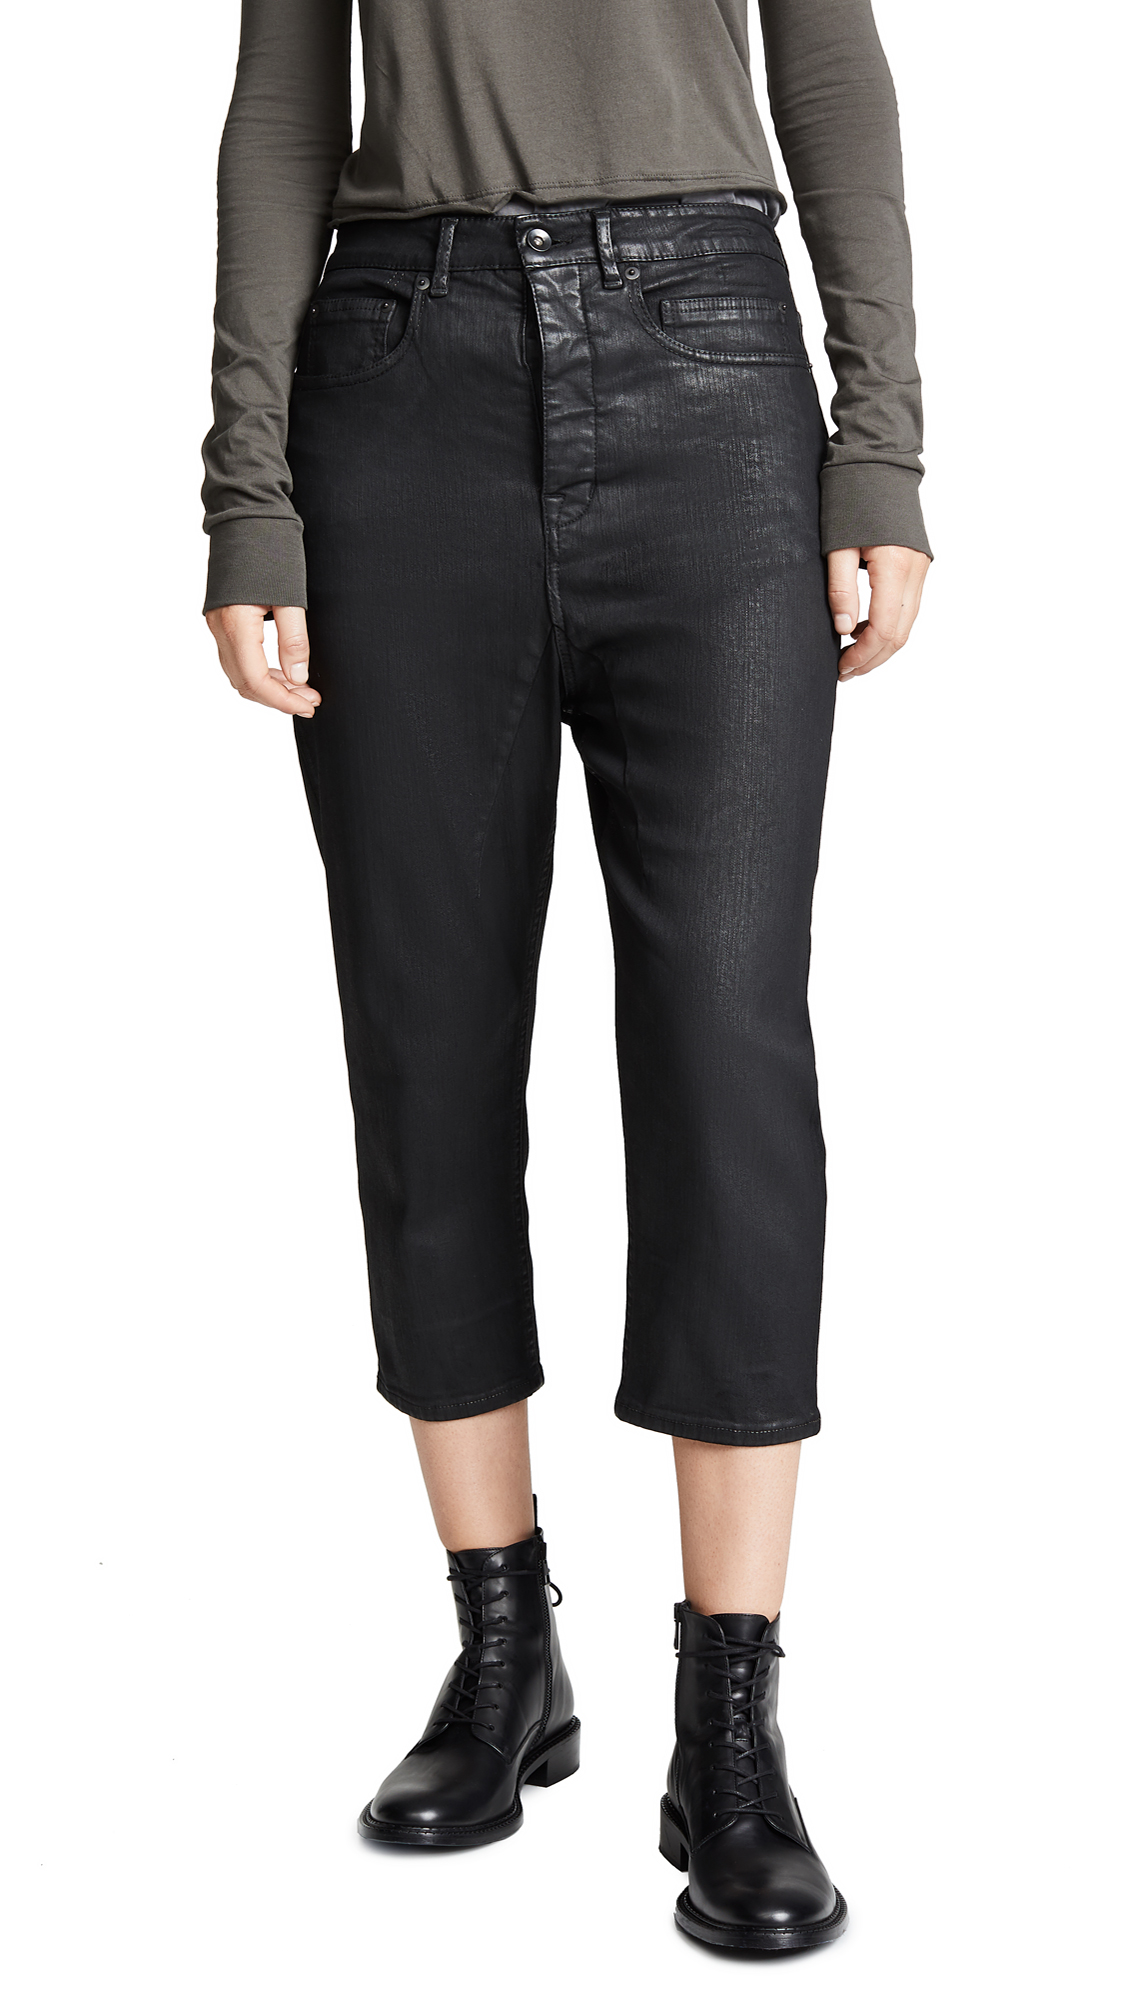 Rick Owens DRKSHDW Collapse Cut Jeans In Black